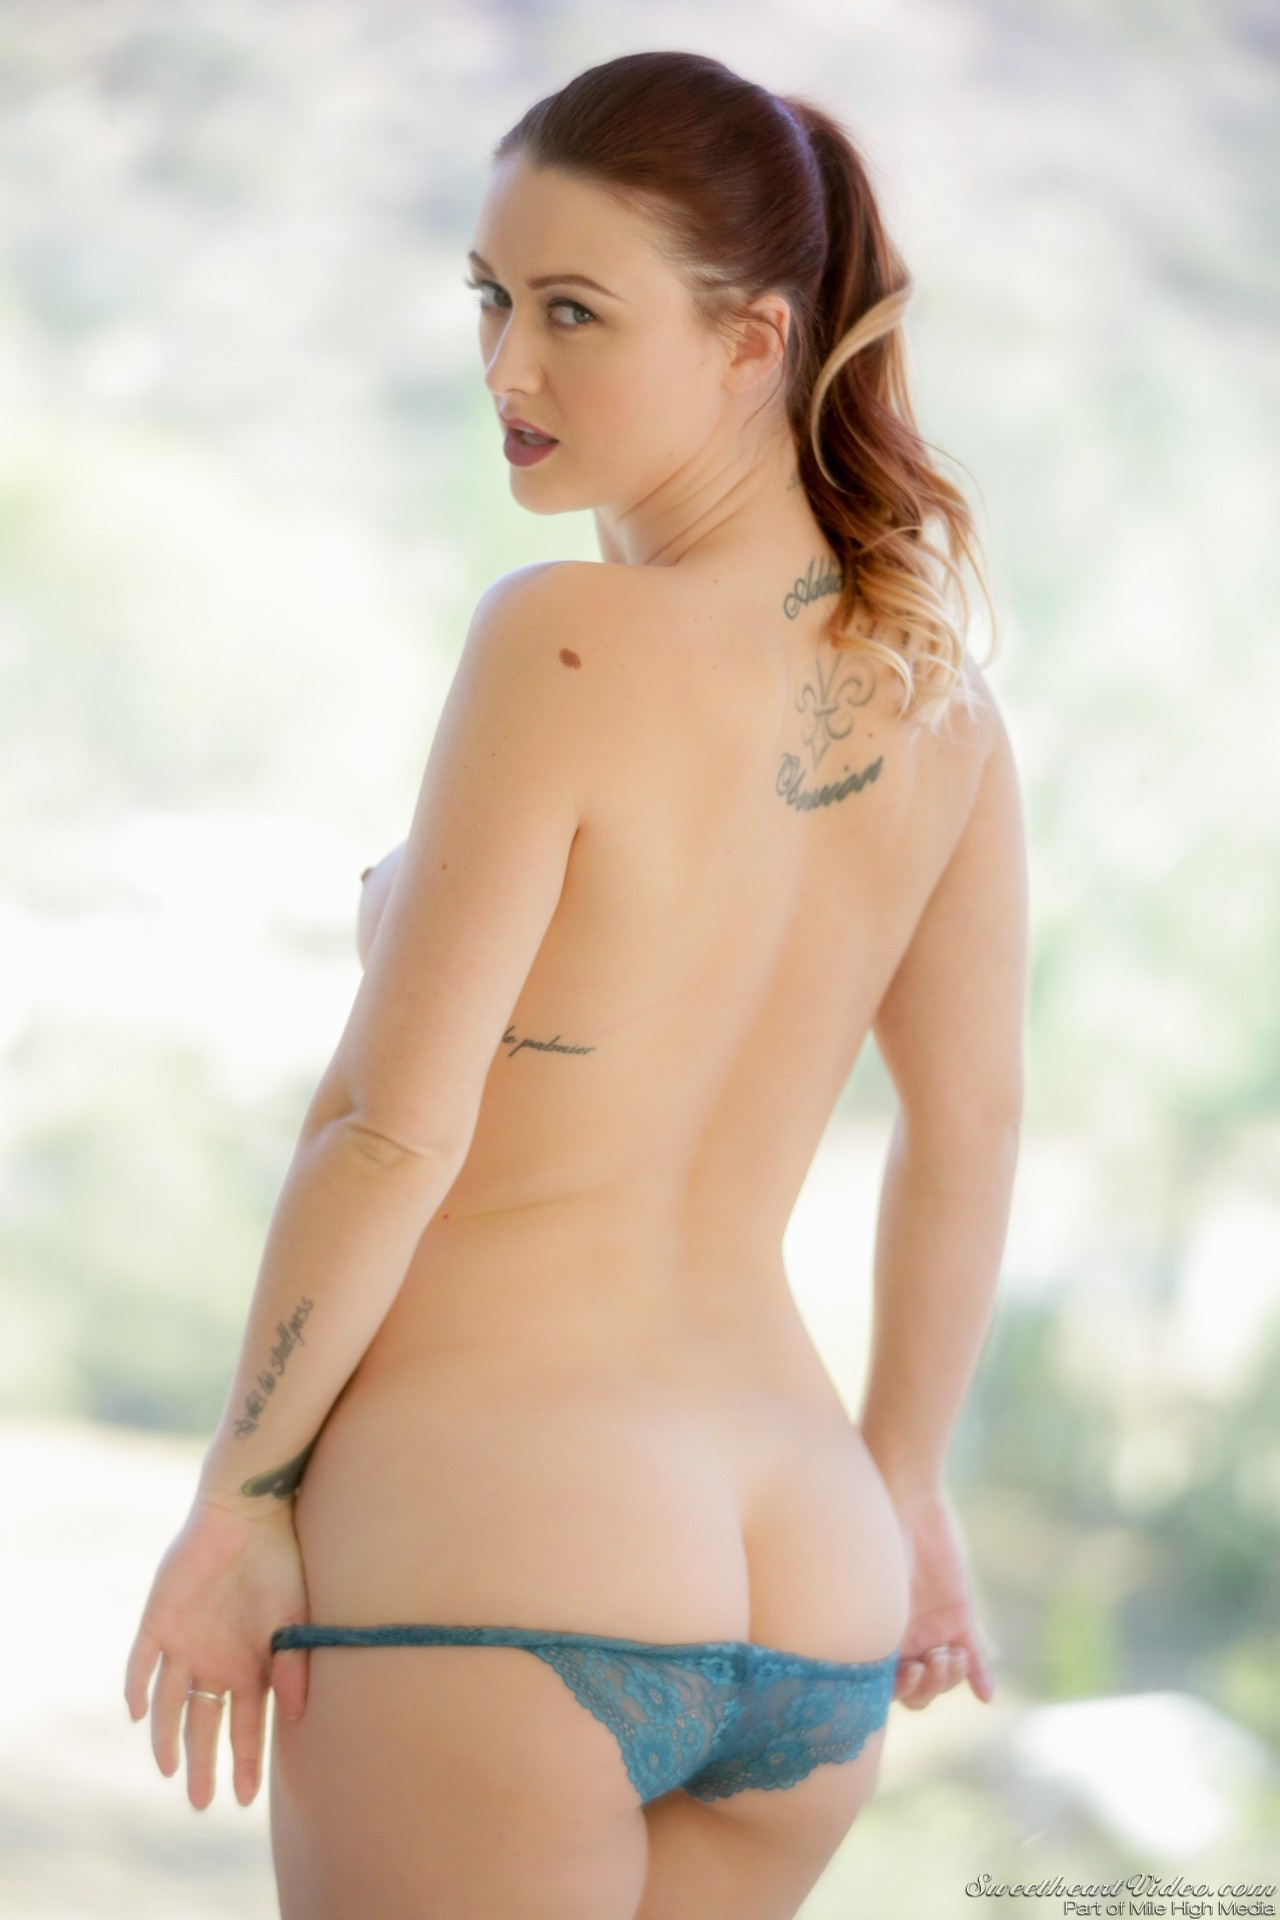 Karlie Montana, Sandy - Girly European oil massage 79153